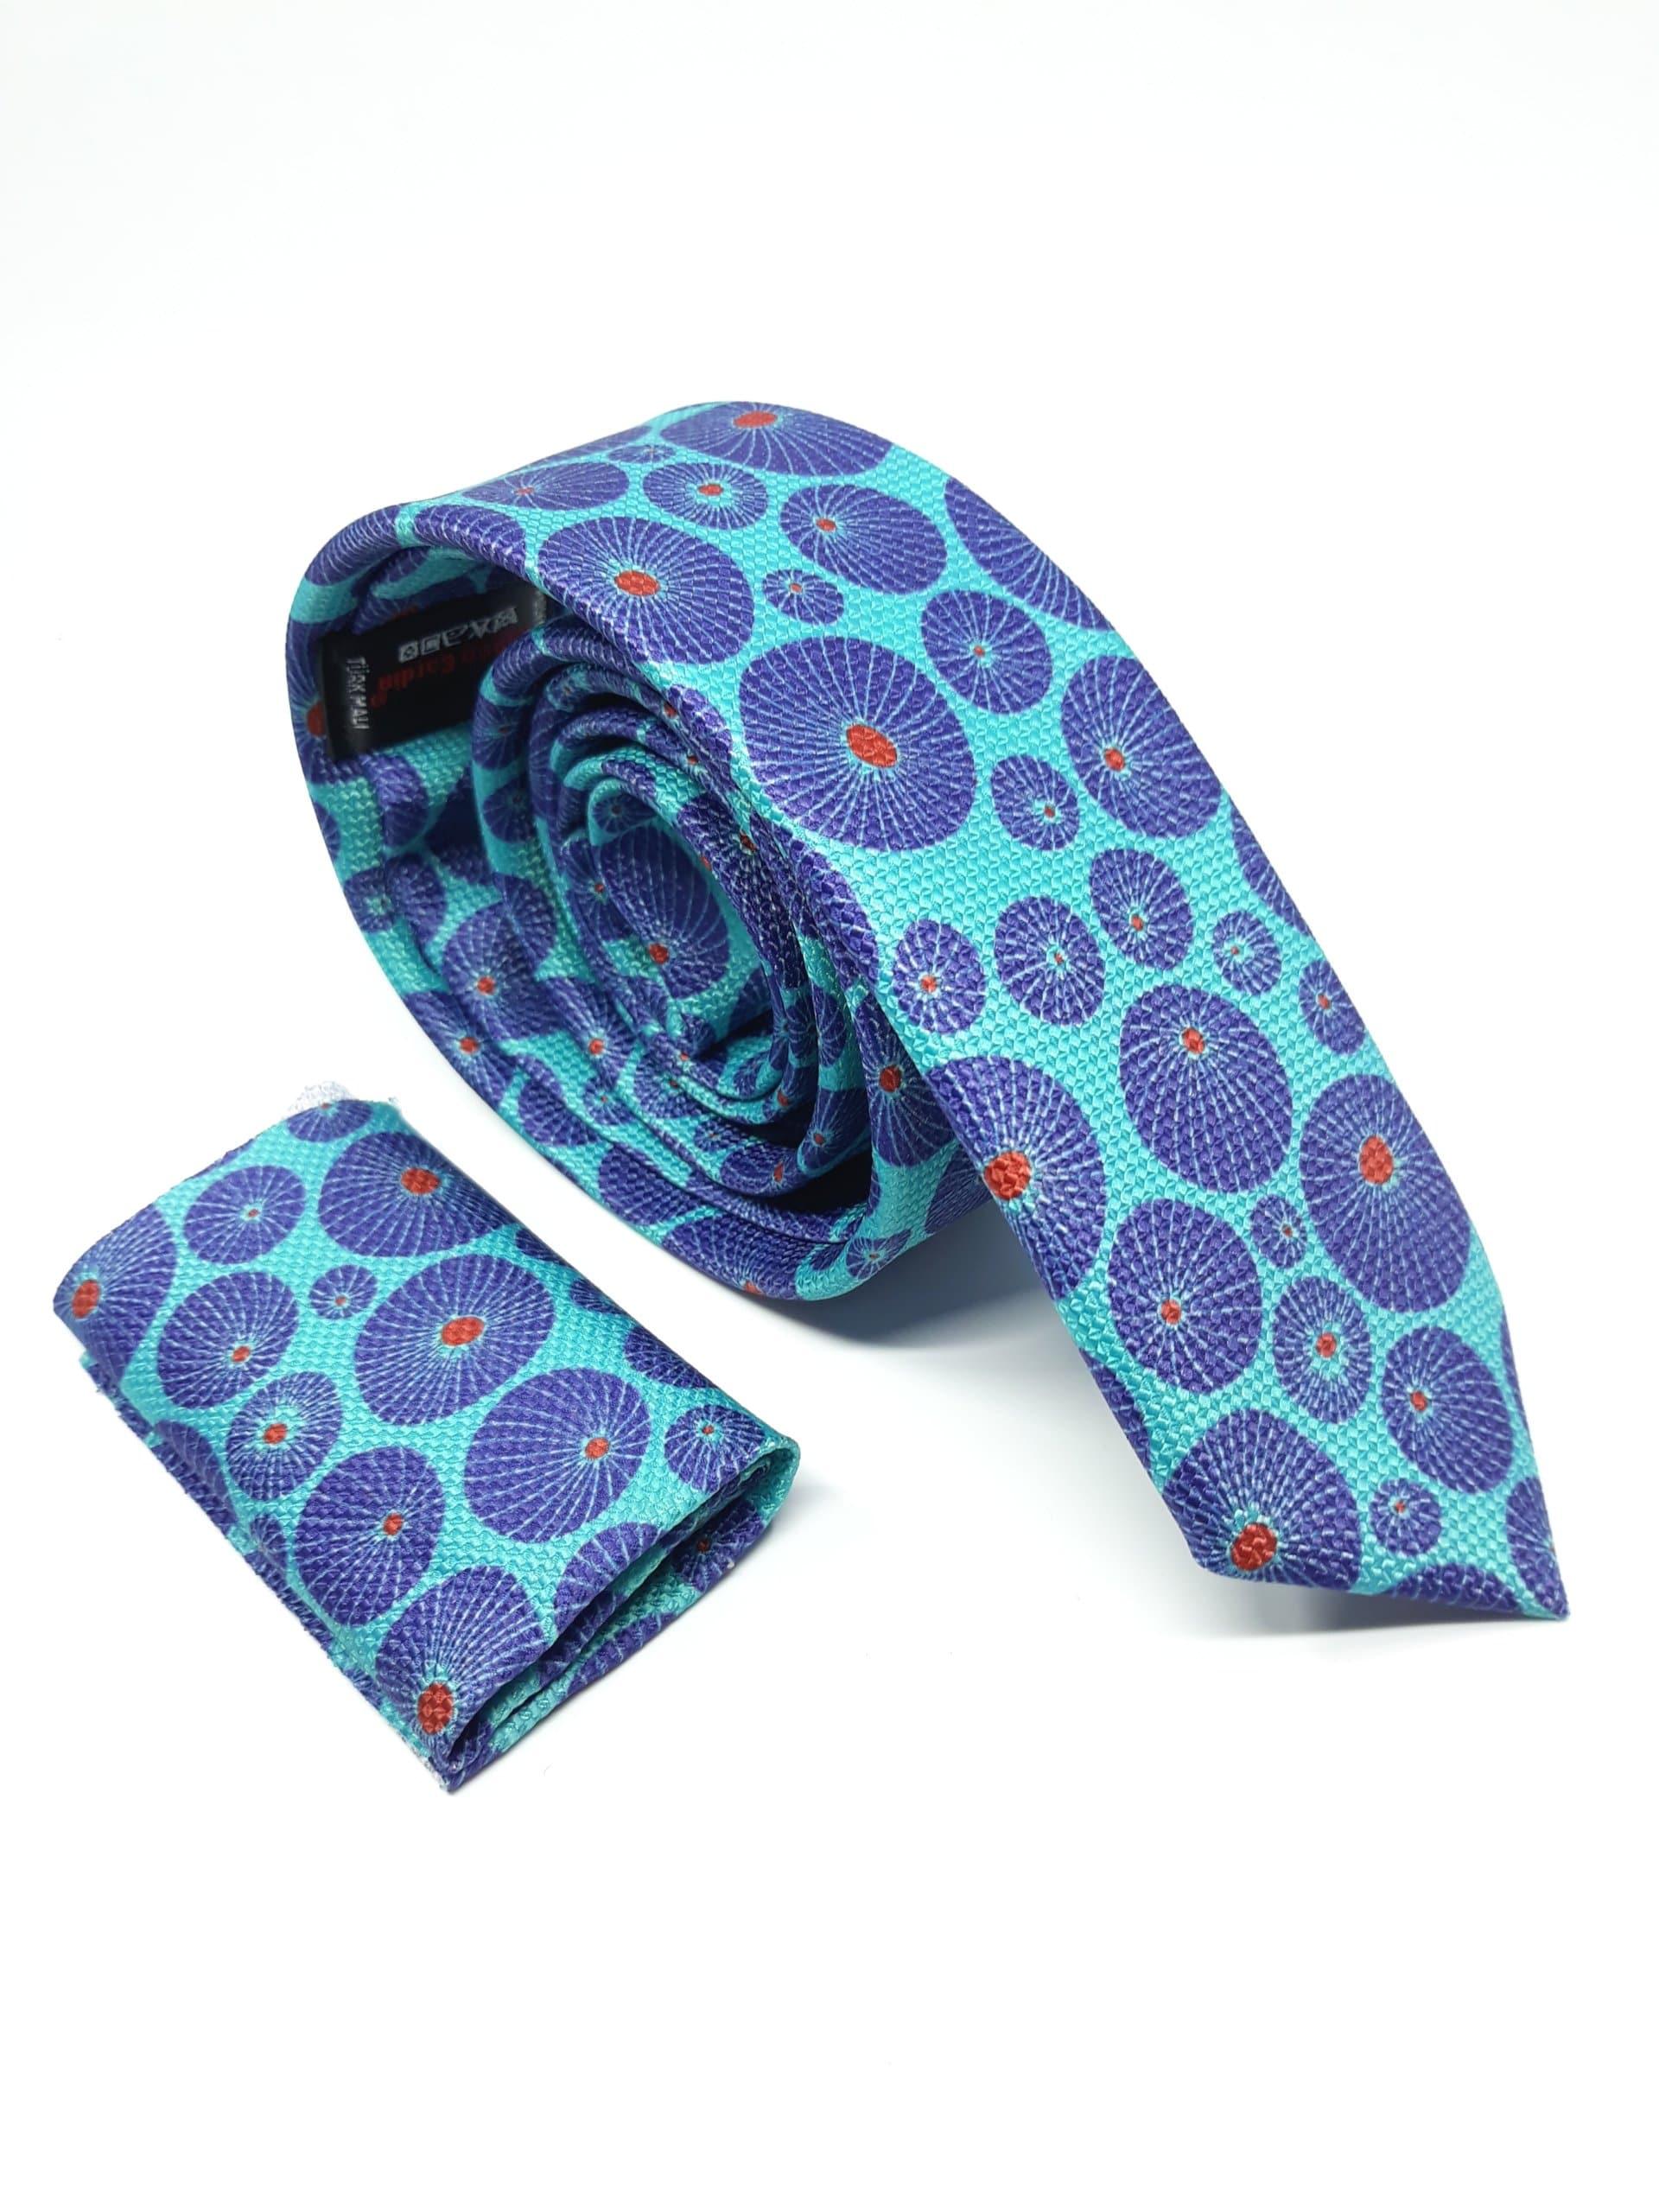 Dodatki Elegancki Krawat Poszetka Komplet Ruben Cardin Koła